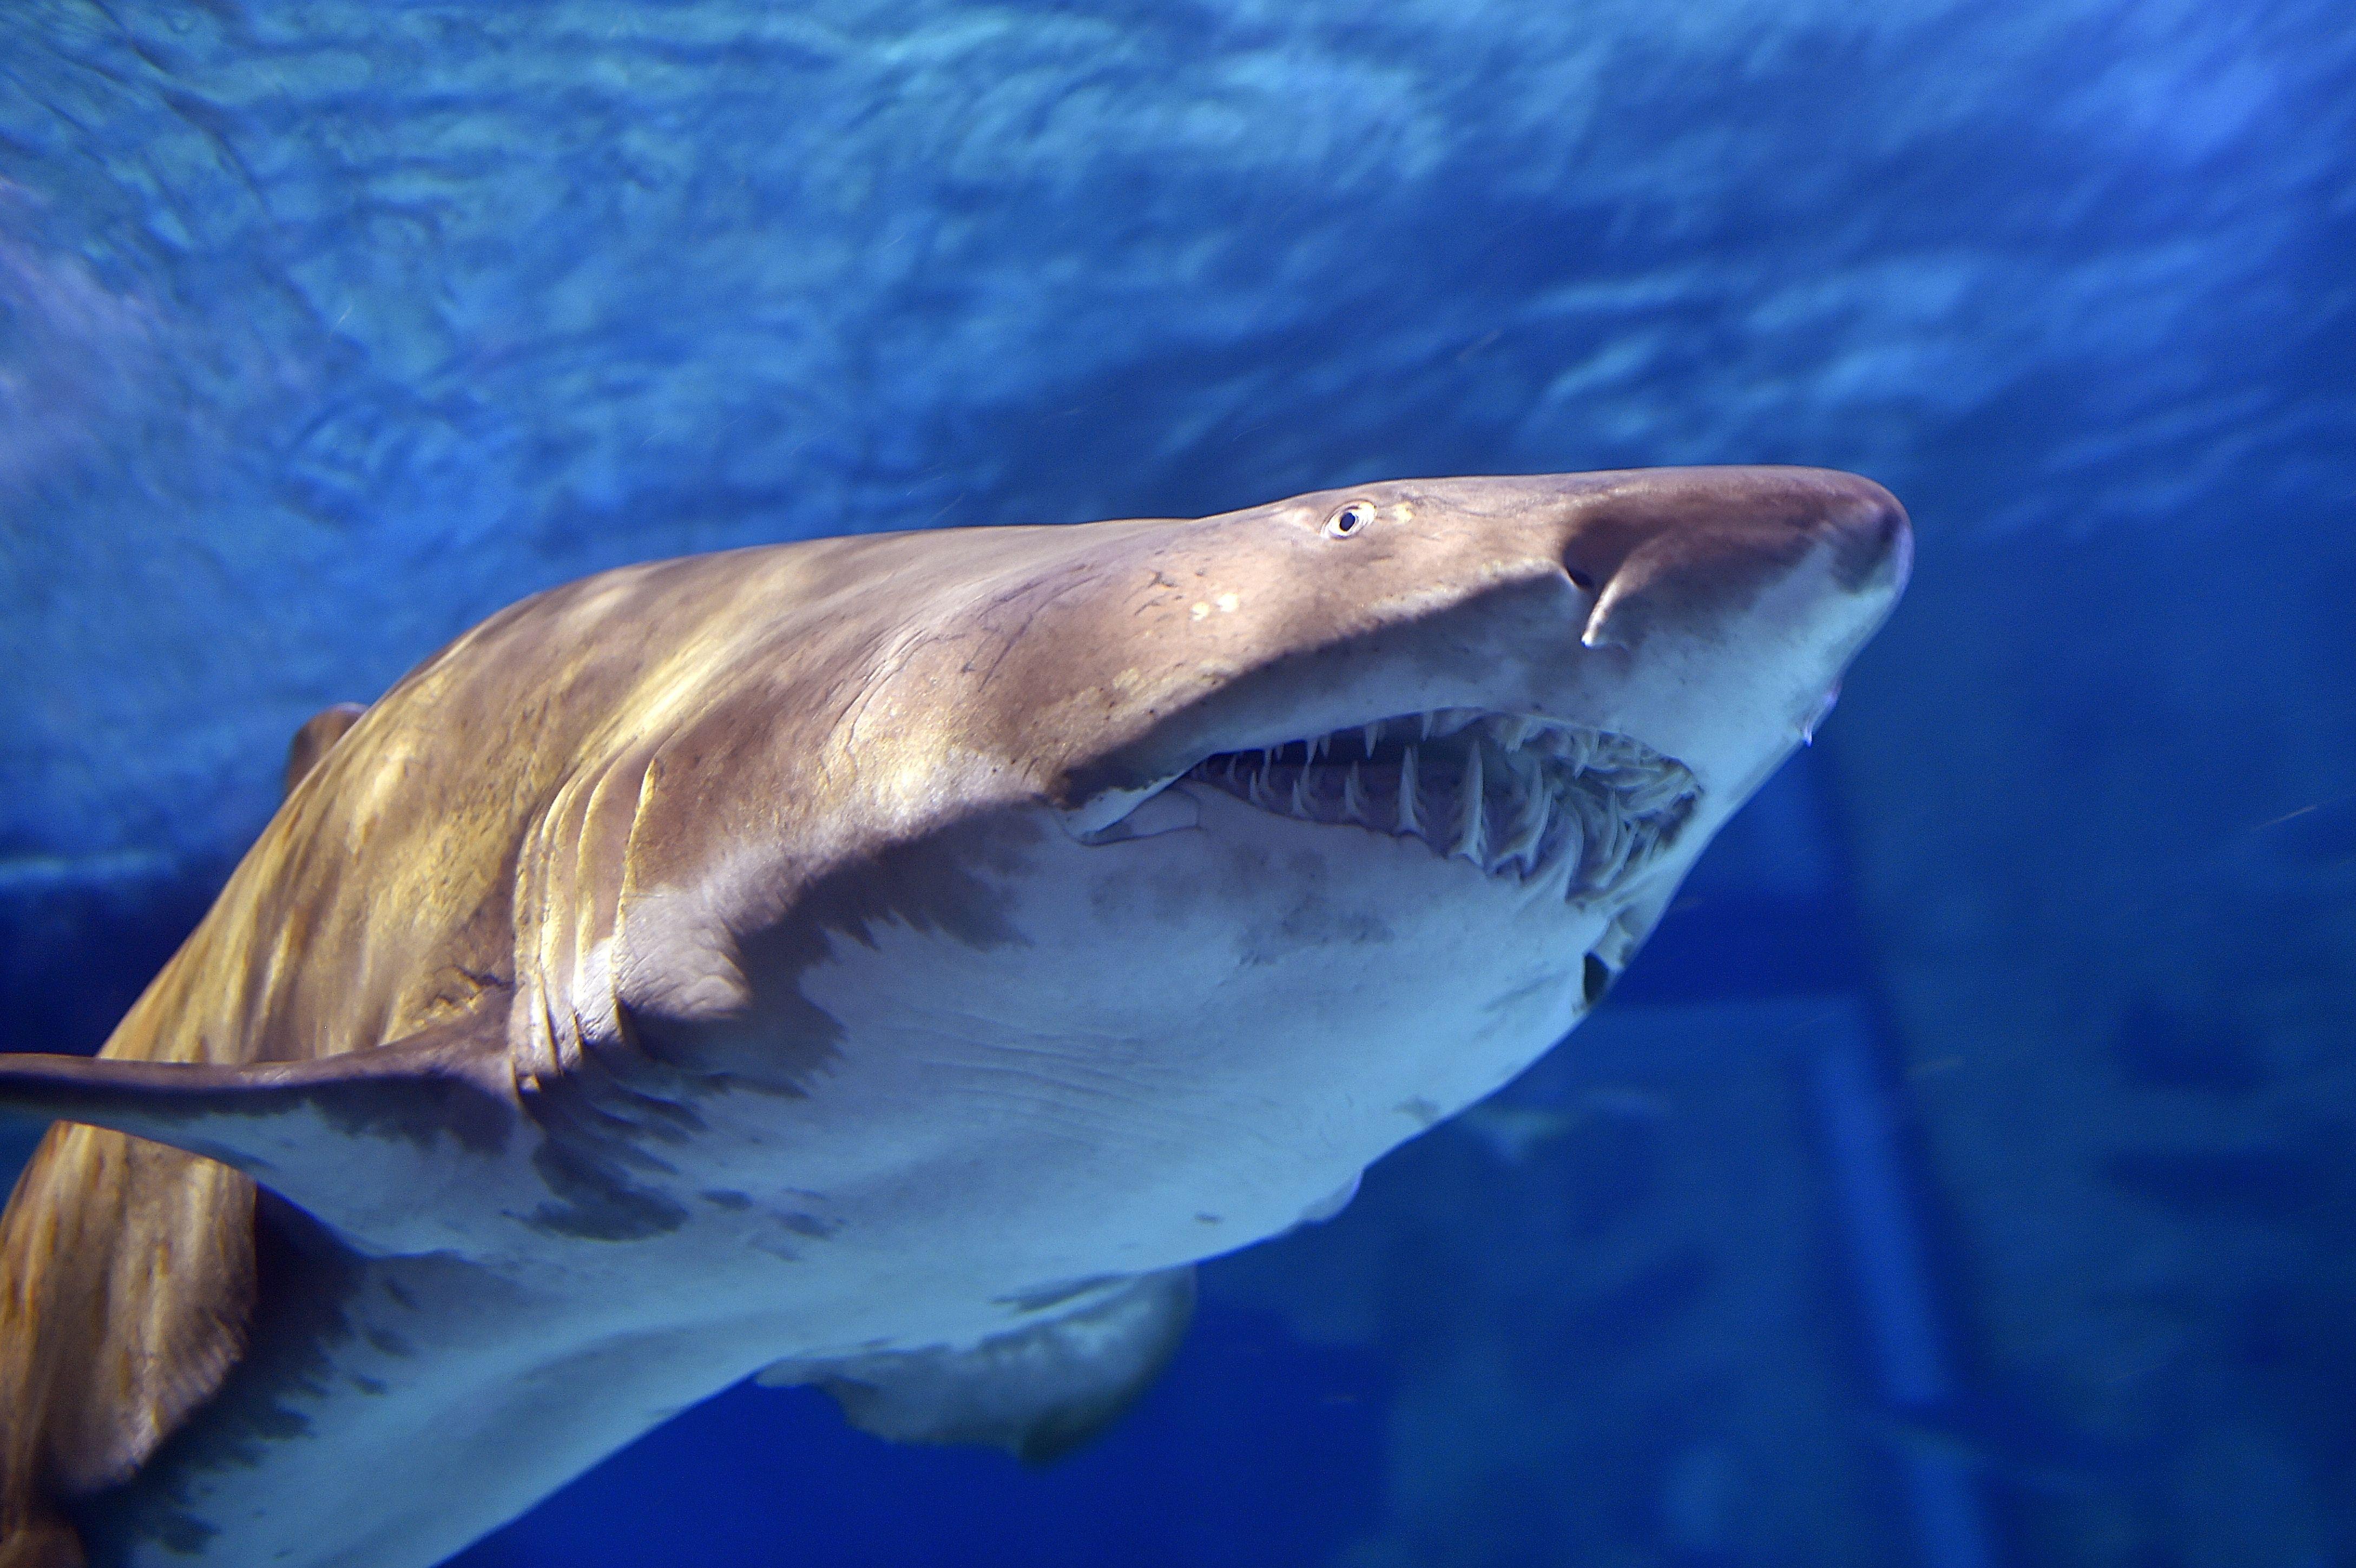 Shark Bites Both Legs Of Swimmer Off Florida Beach